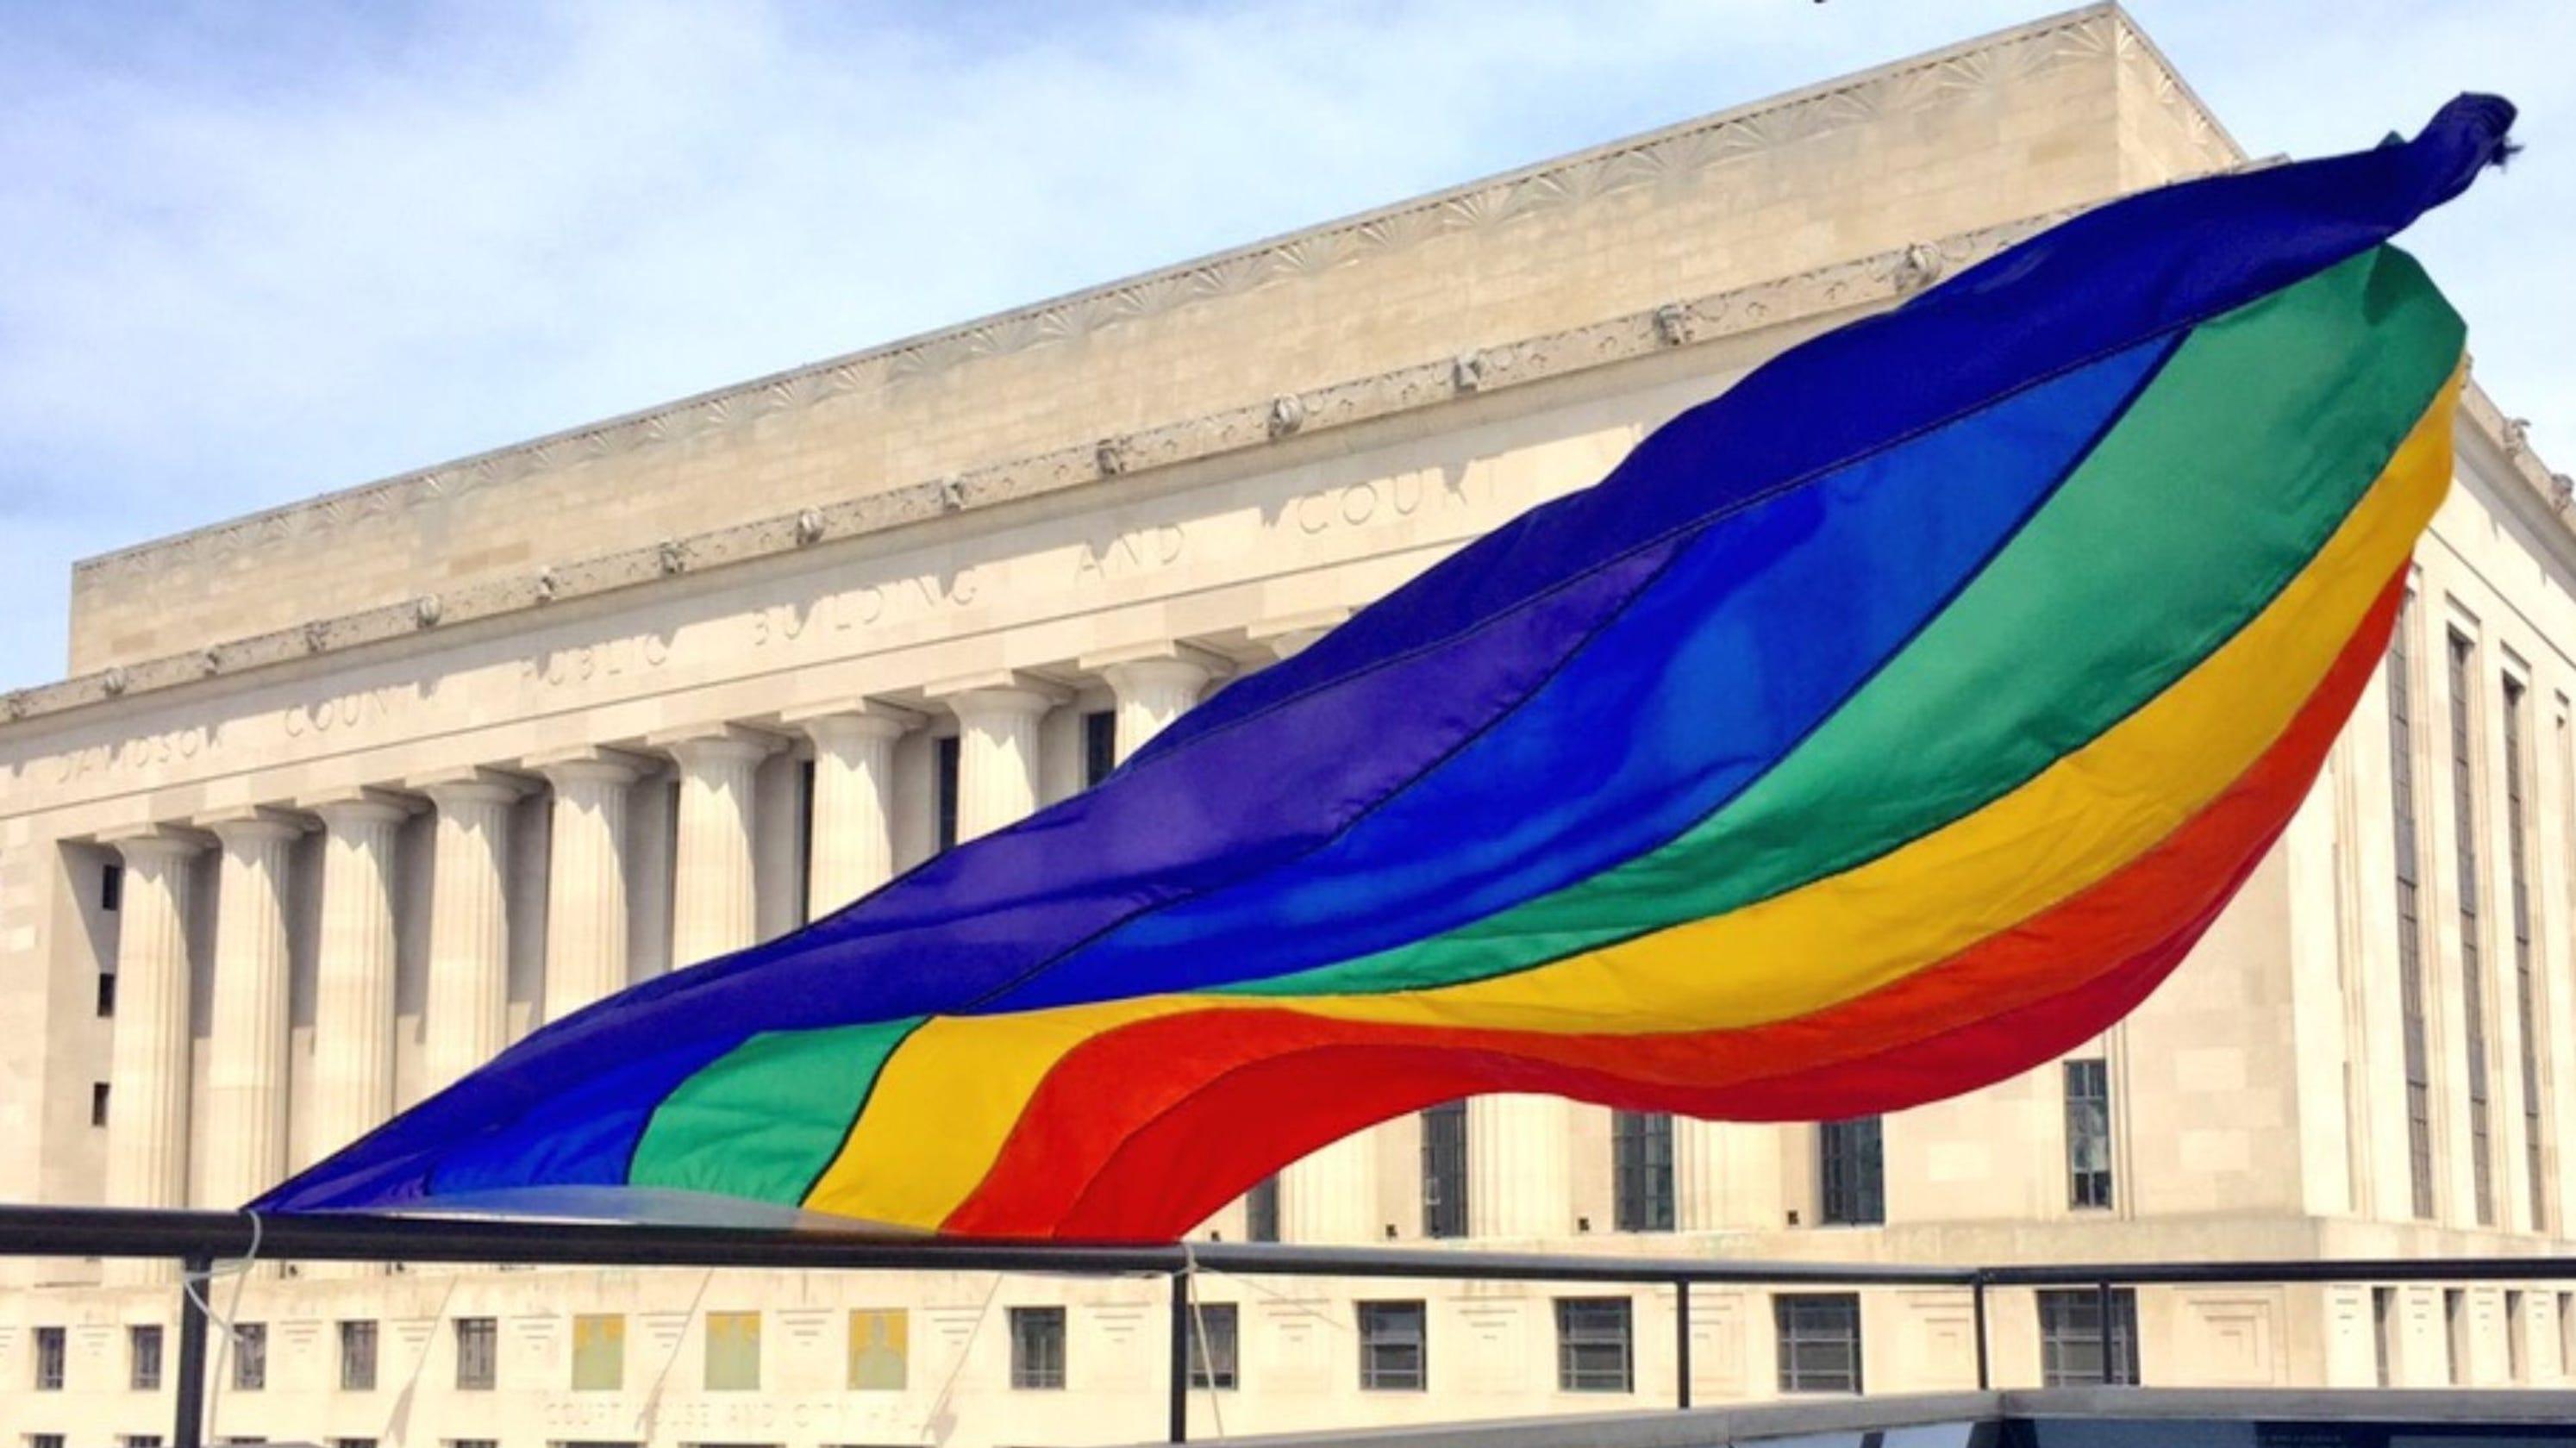 LGBT bills in Tennessean: Warner Music, Curb speak out